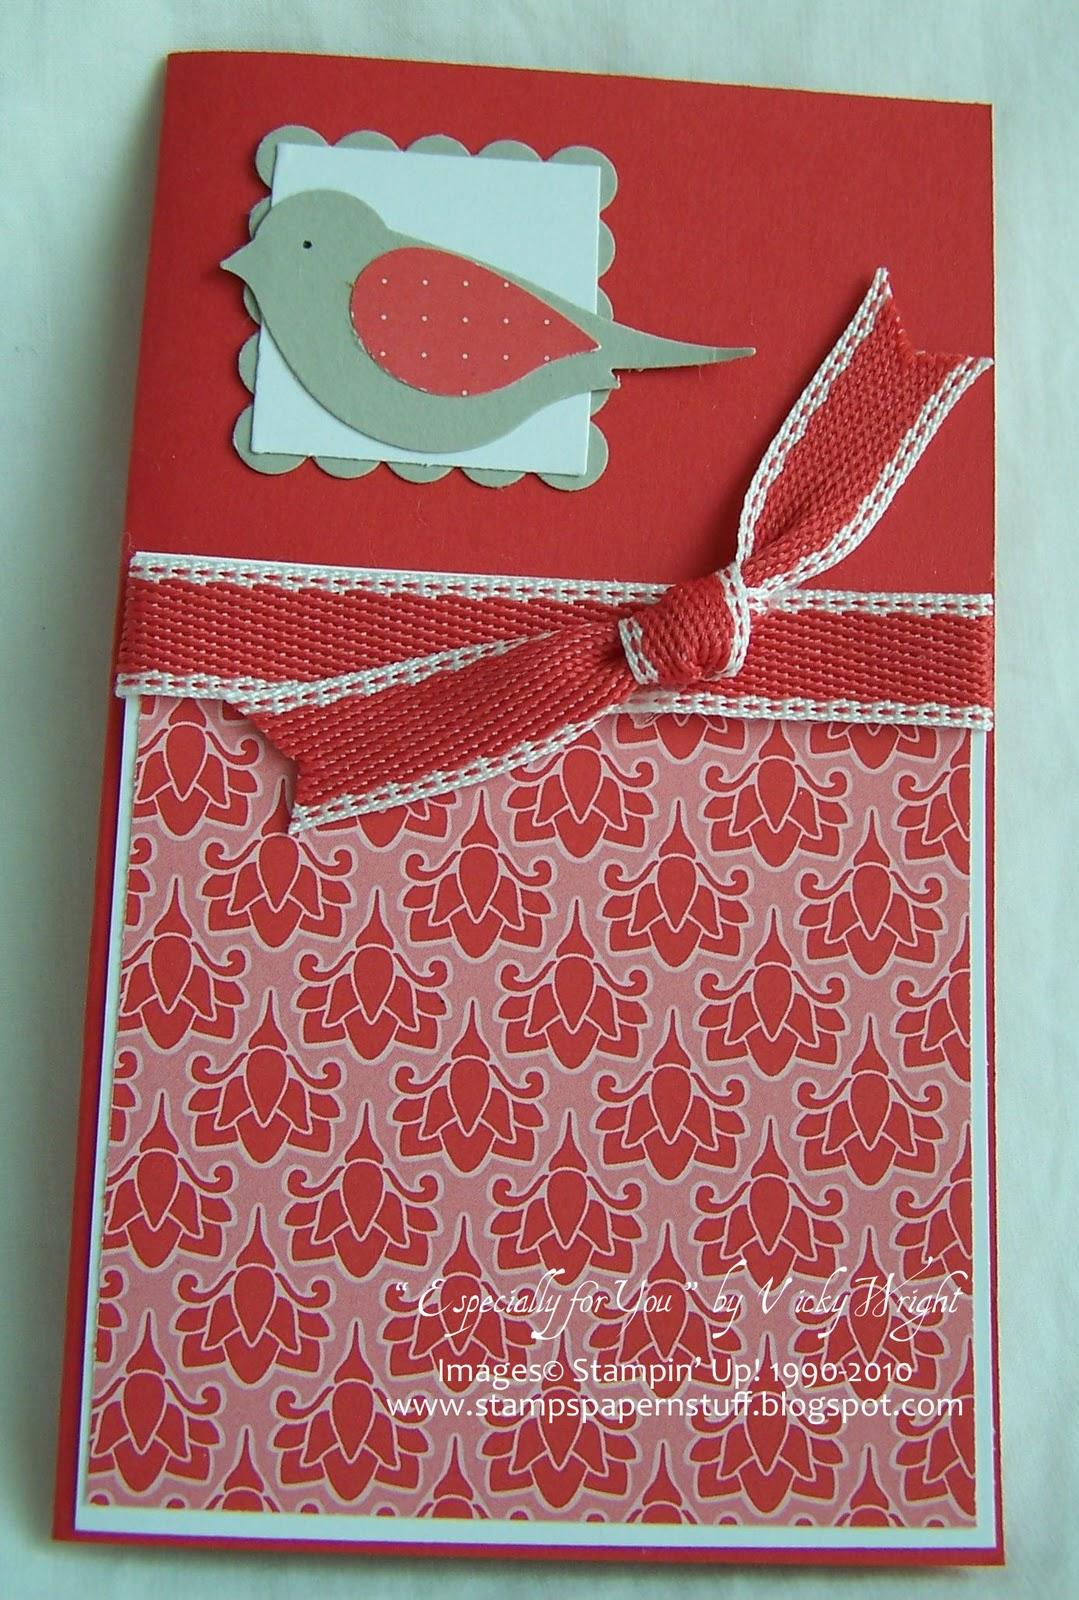 Stampin' Up!®: Greeting Cards